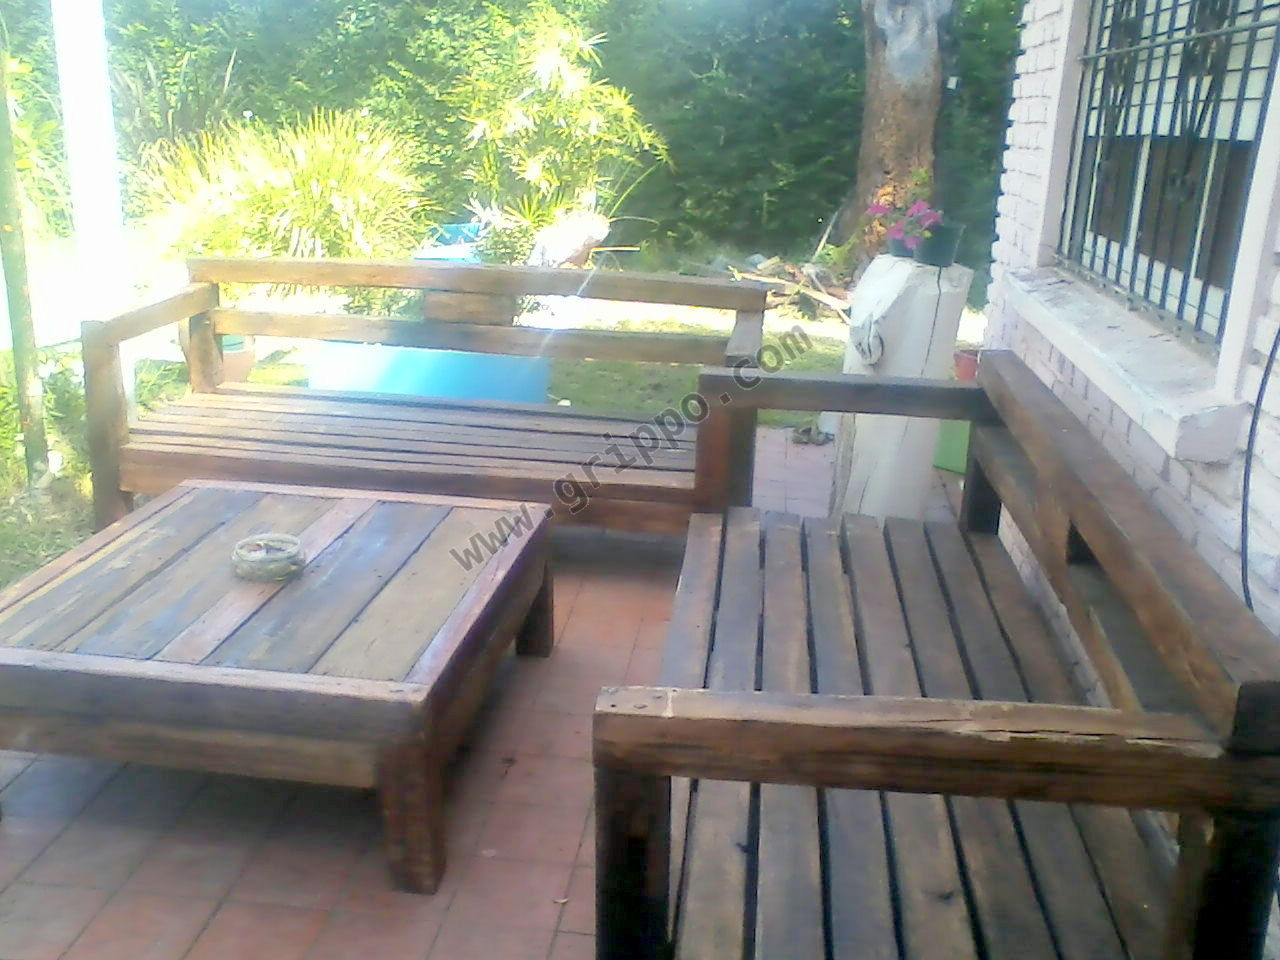 muebles rusticos en madera dura para exterior e interior